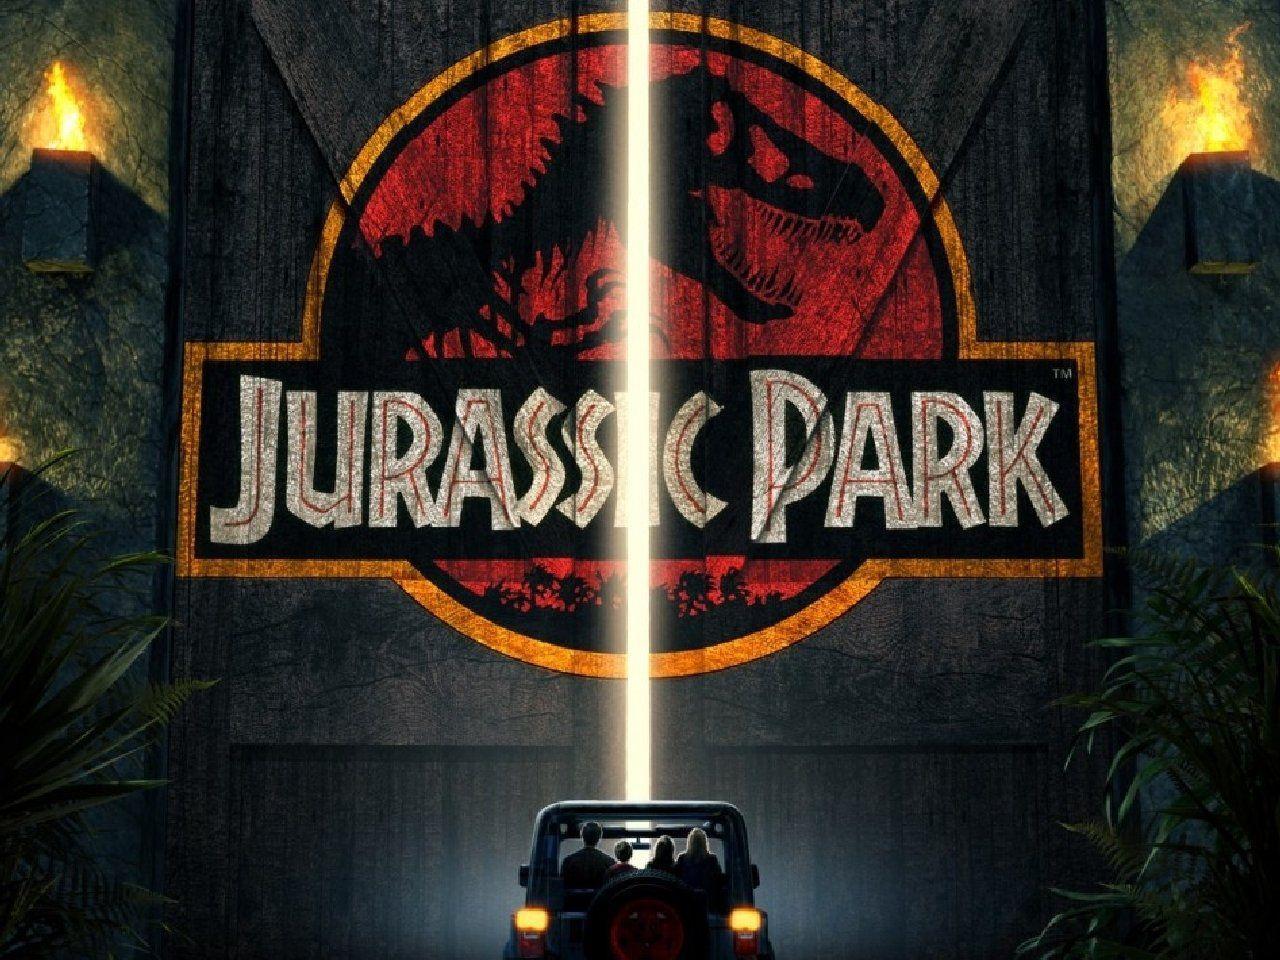 jurassic park video download free